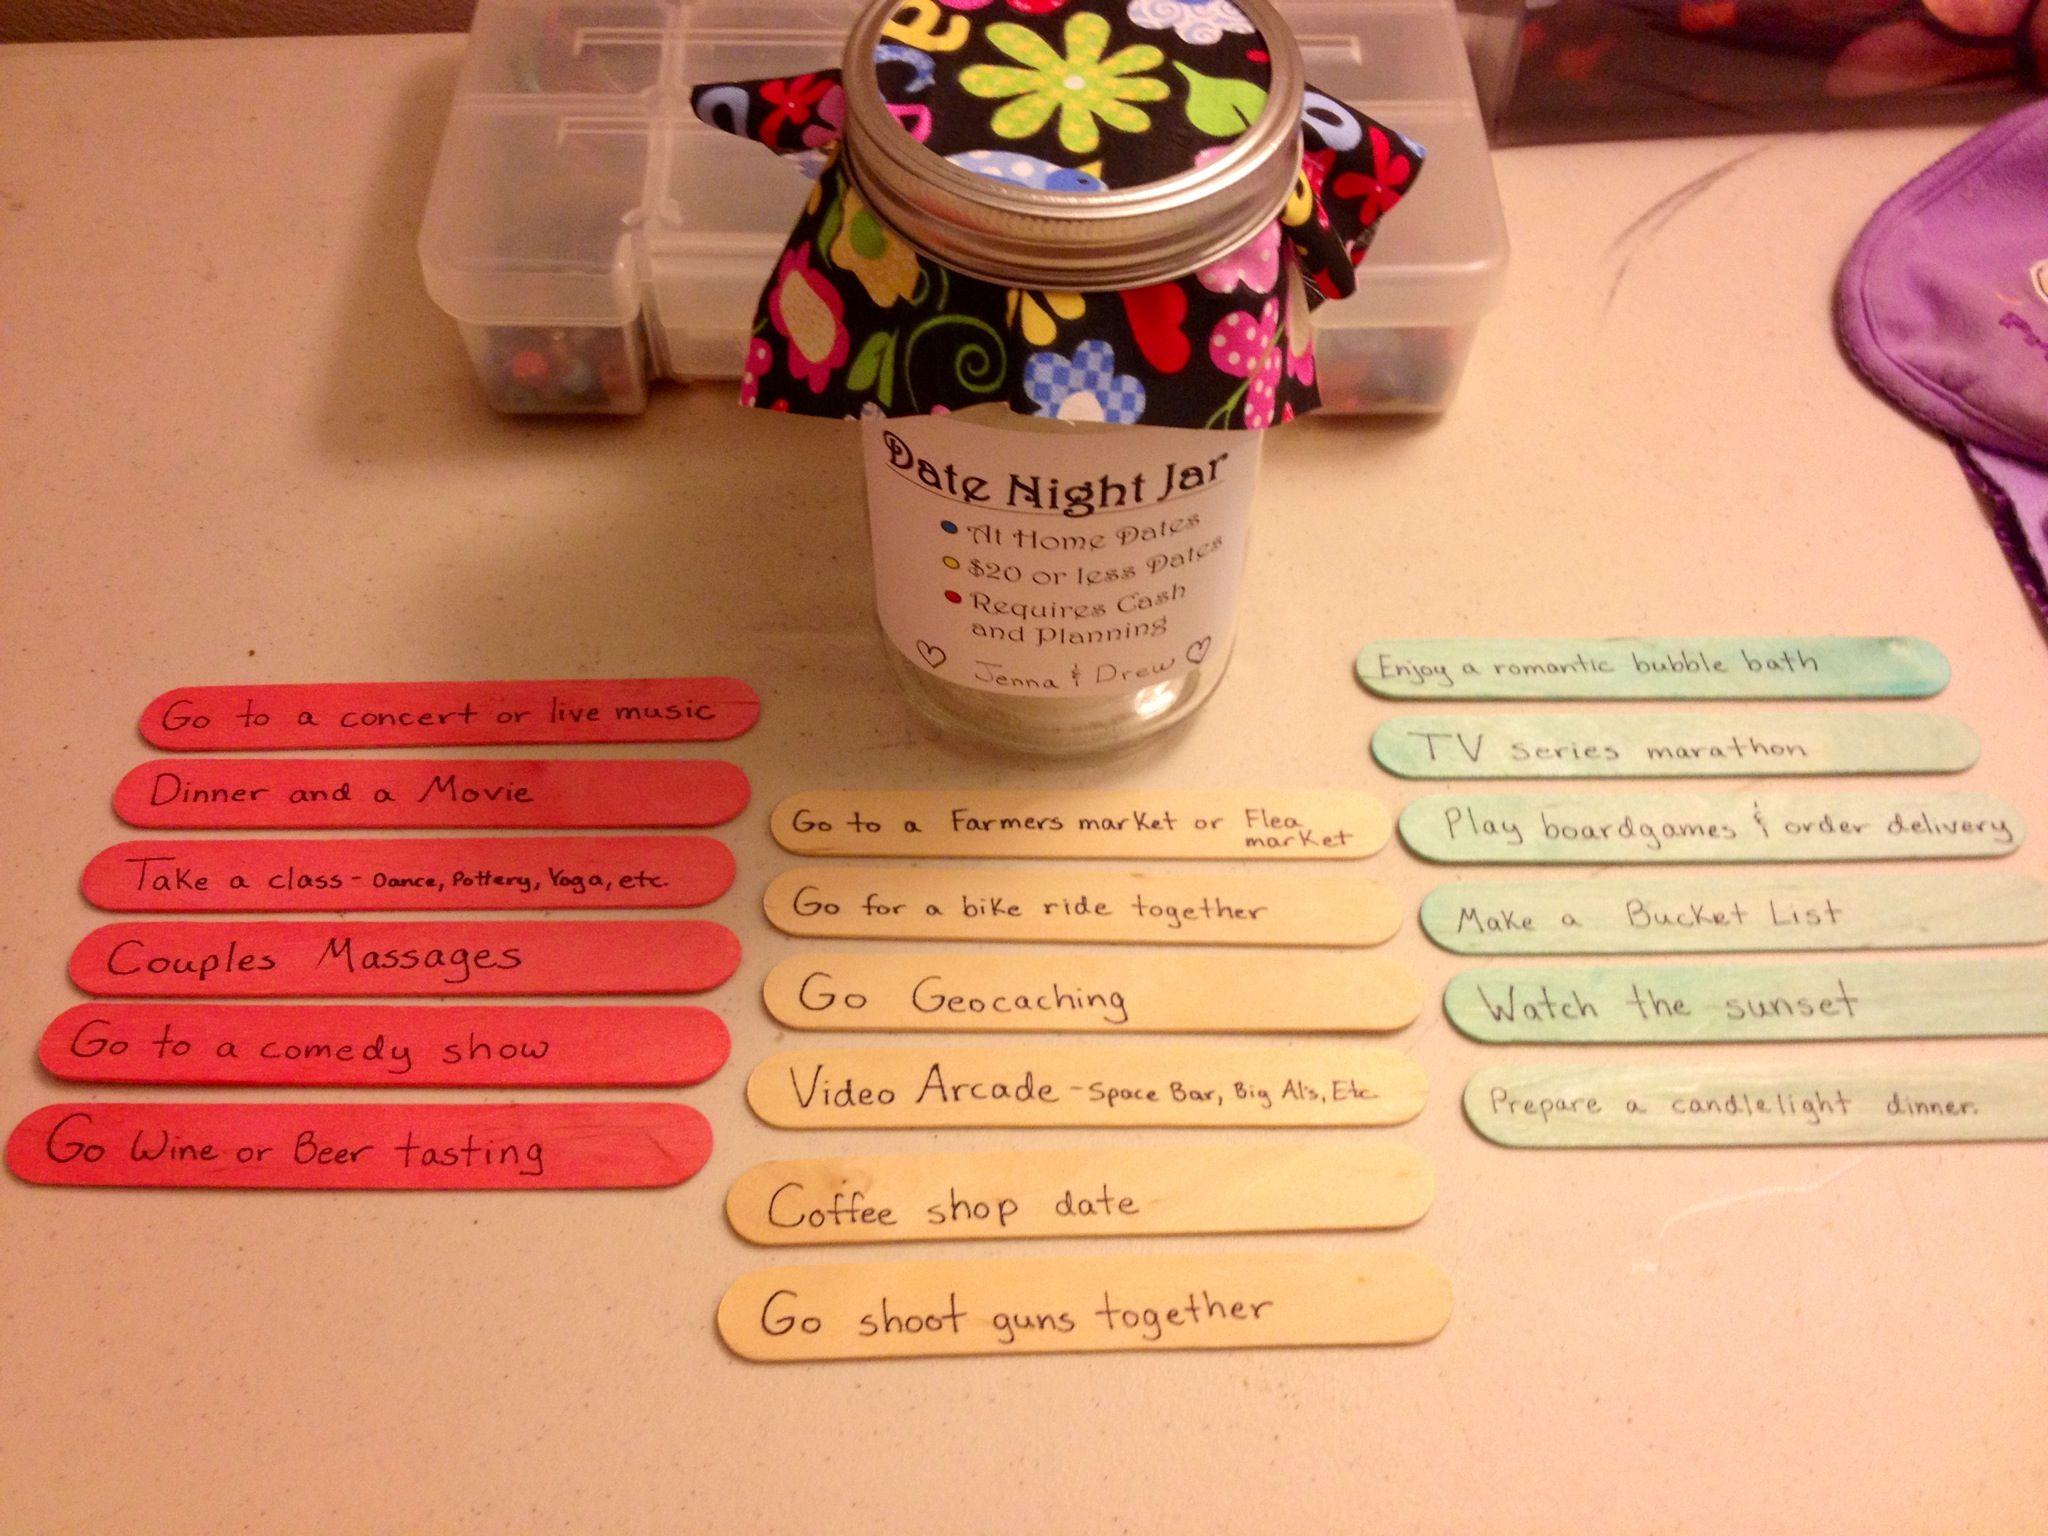 Pin By Jennifer Galli On Date Ideas Date Night Jar Diy Wedding Presents Jar Gifts